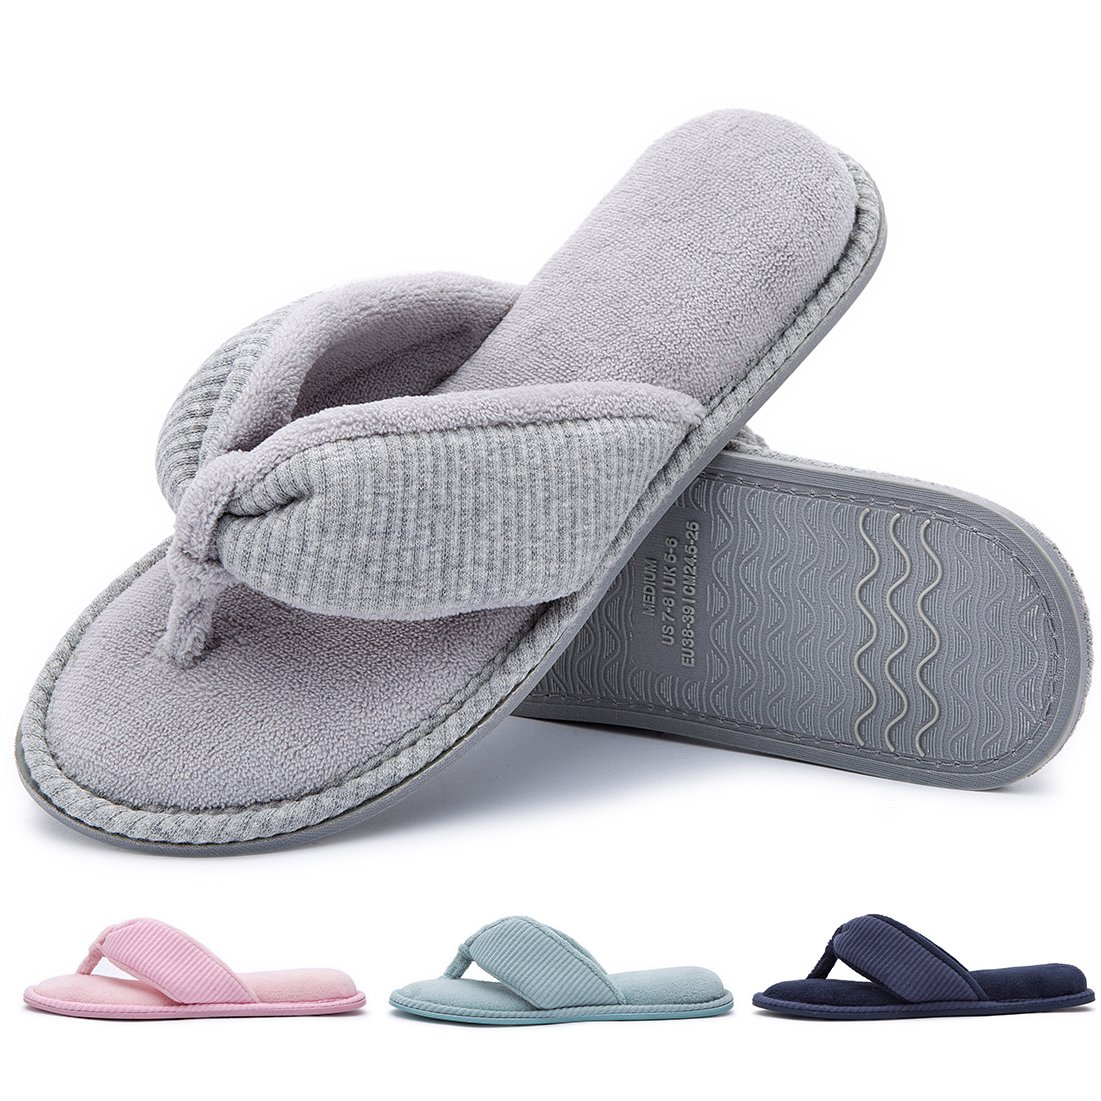 RockDove Women's Memory Foam House Spa Thong Slippers(9-10 B(M) US,Grey)